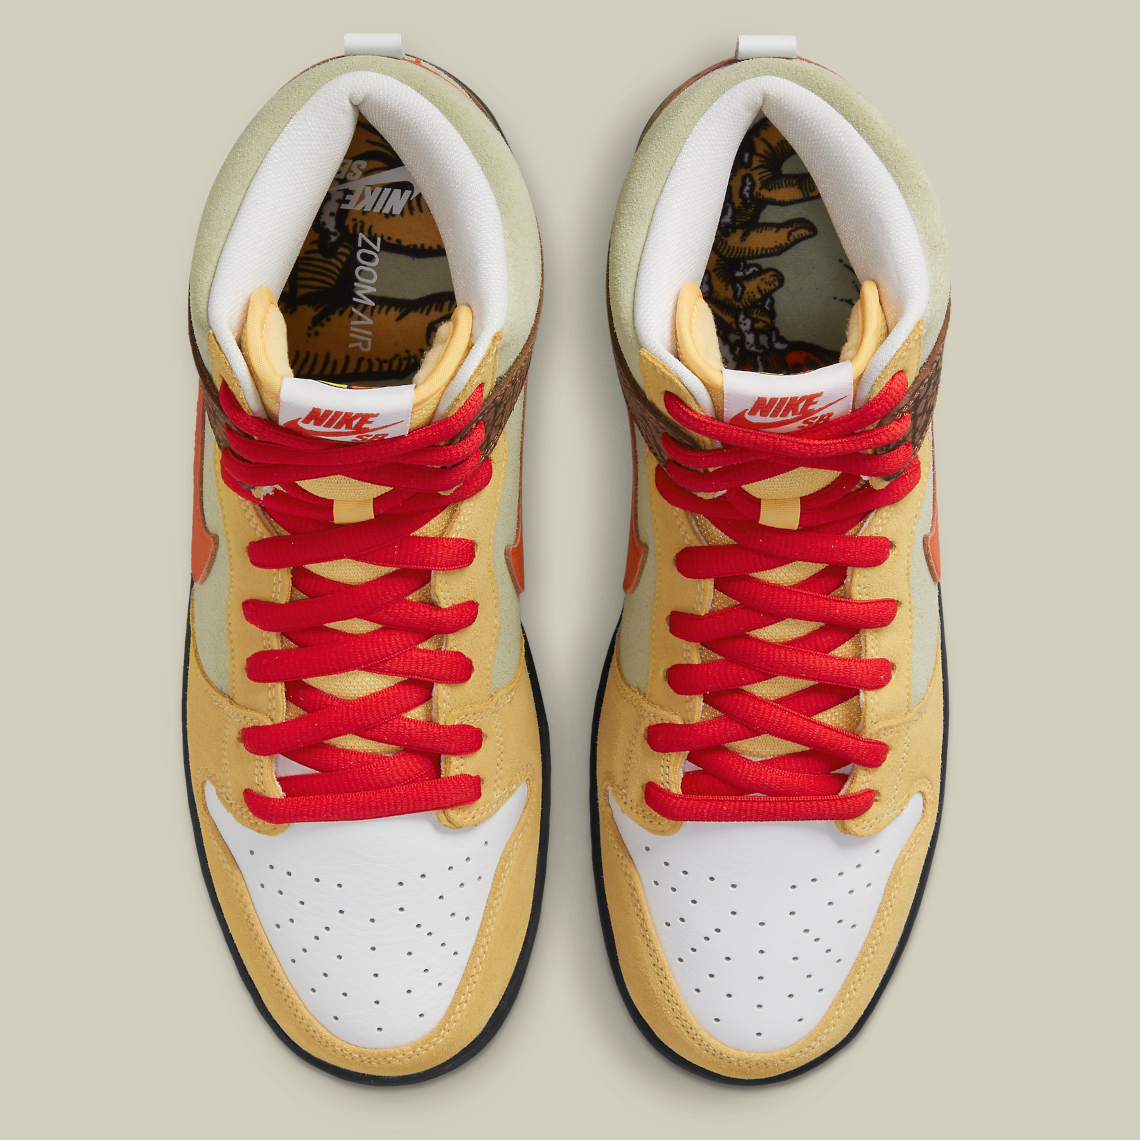 Nike-SB-Dunk-High-CZ2205-700-Color-Skates-CZ2205-700-5.jpg?w=1140